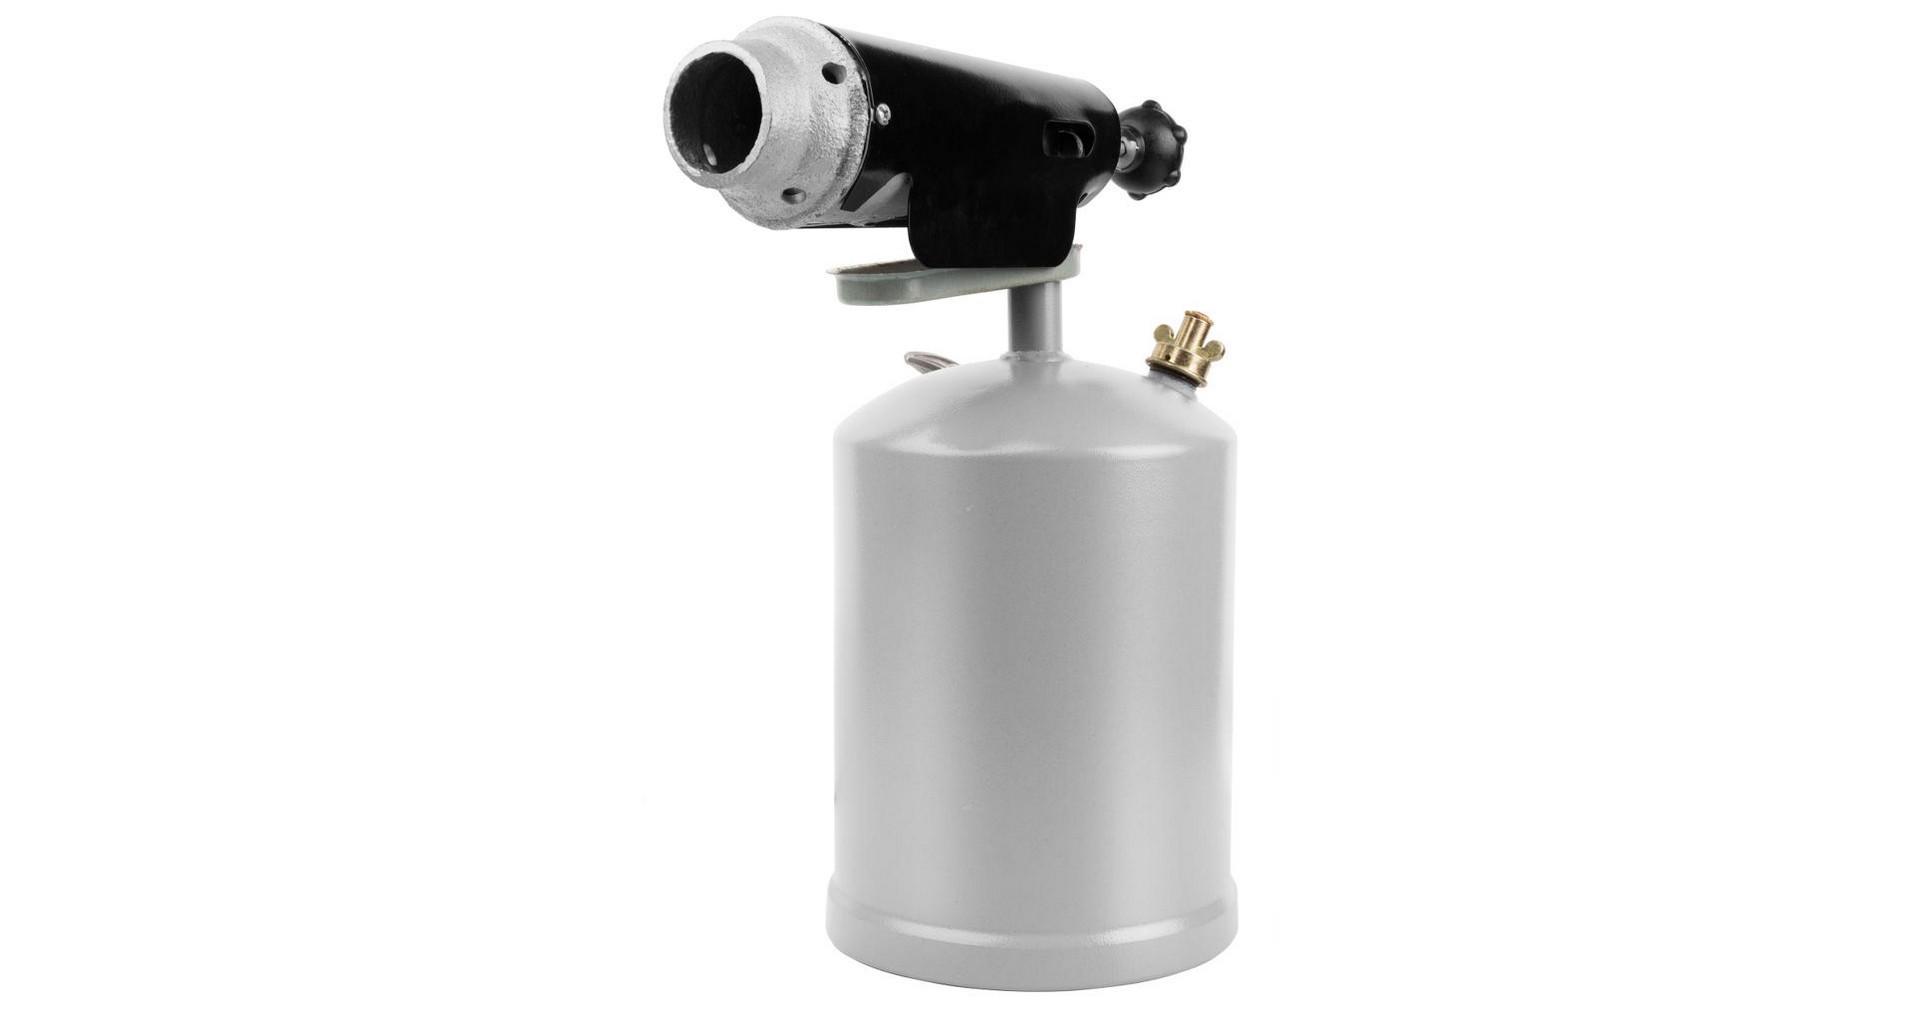 Паяльная лампа бензиновая Россия Vita - 3,5 л 3